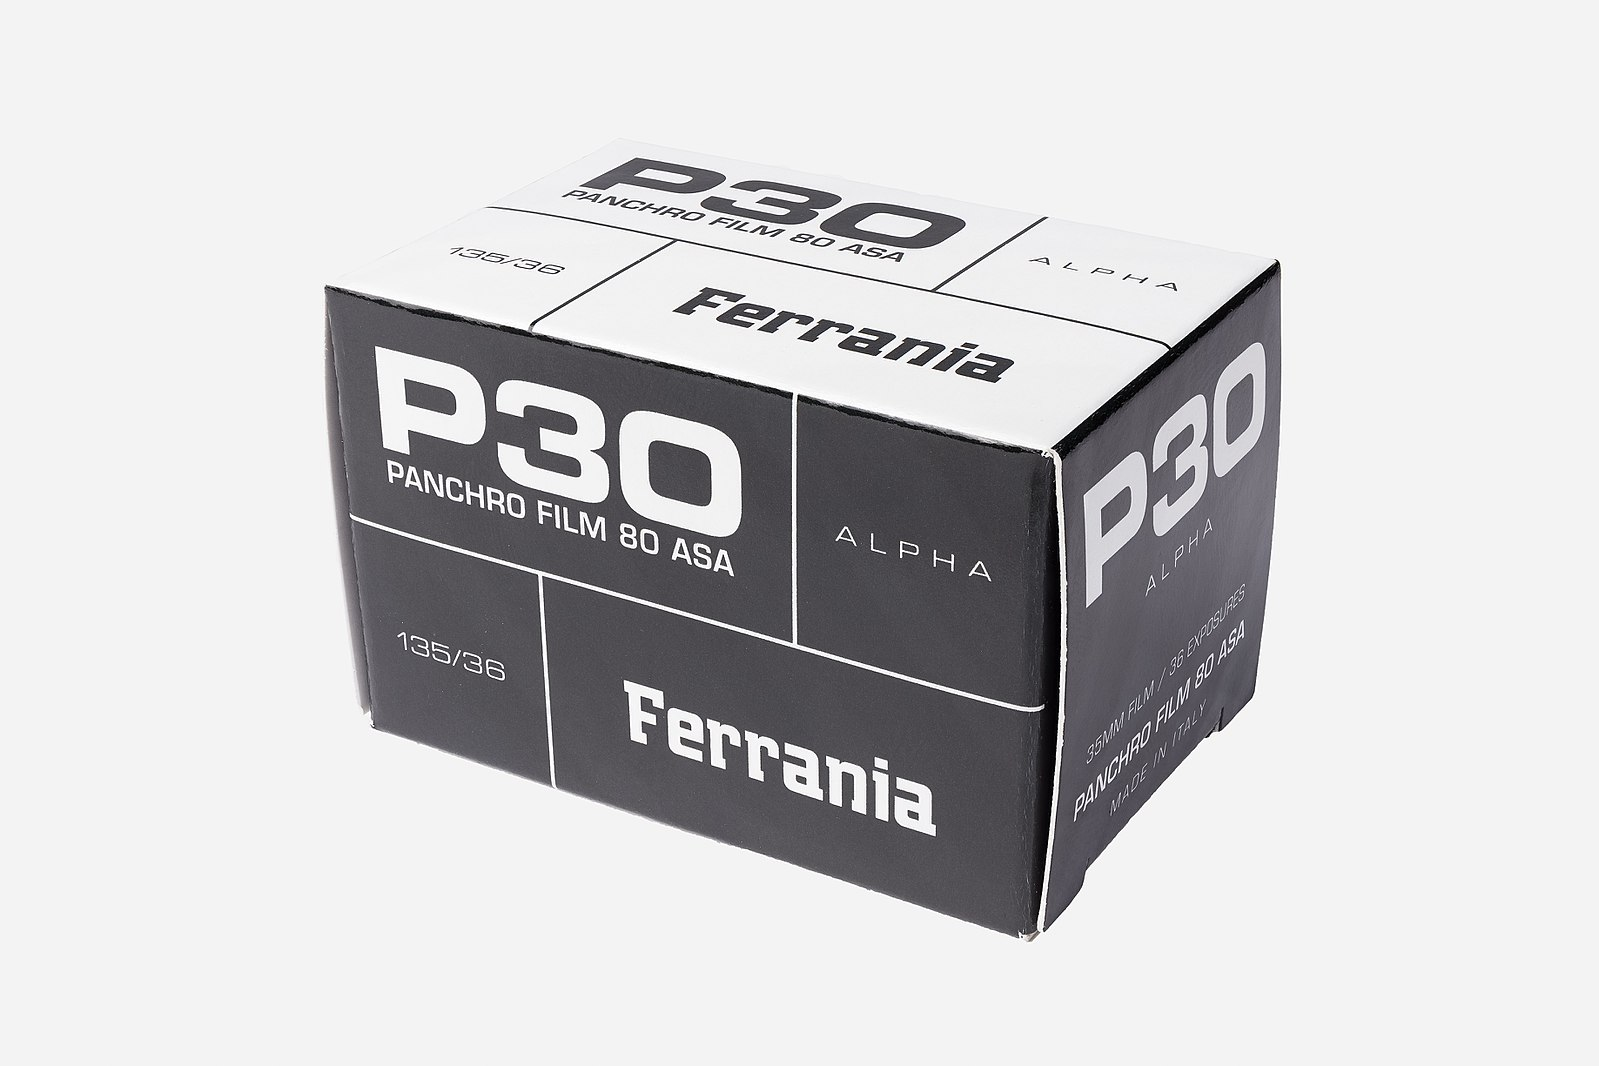 FILM Ferrania P30 (Pic: Ansgar Koreng/Wikimedia Commons)